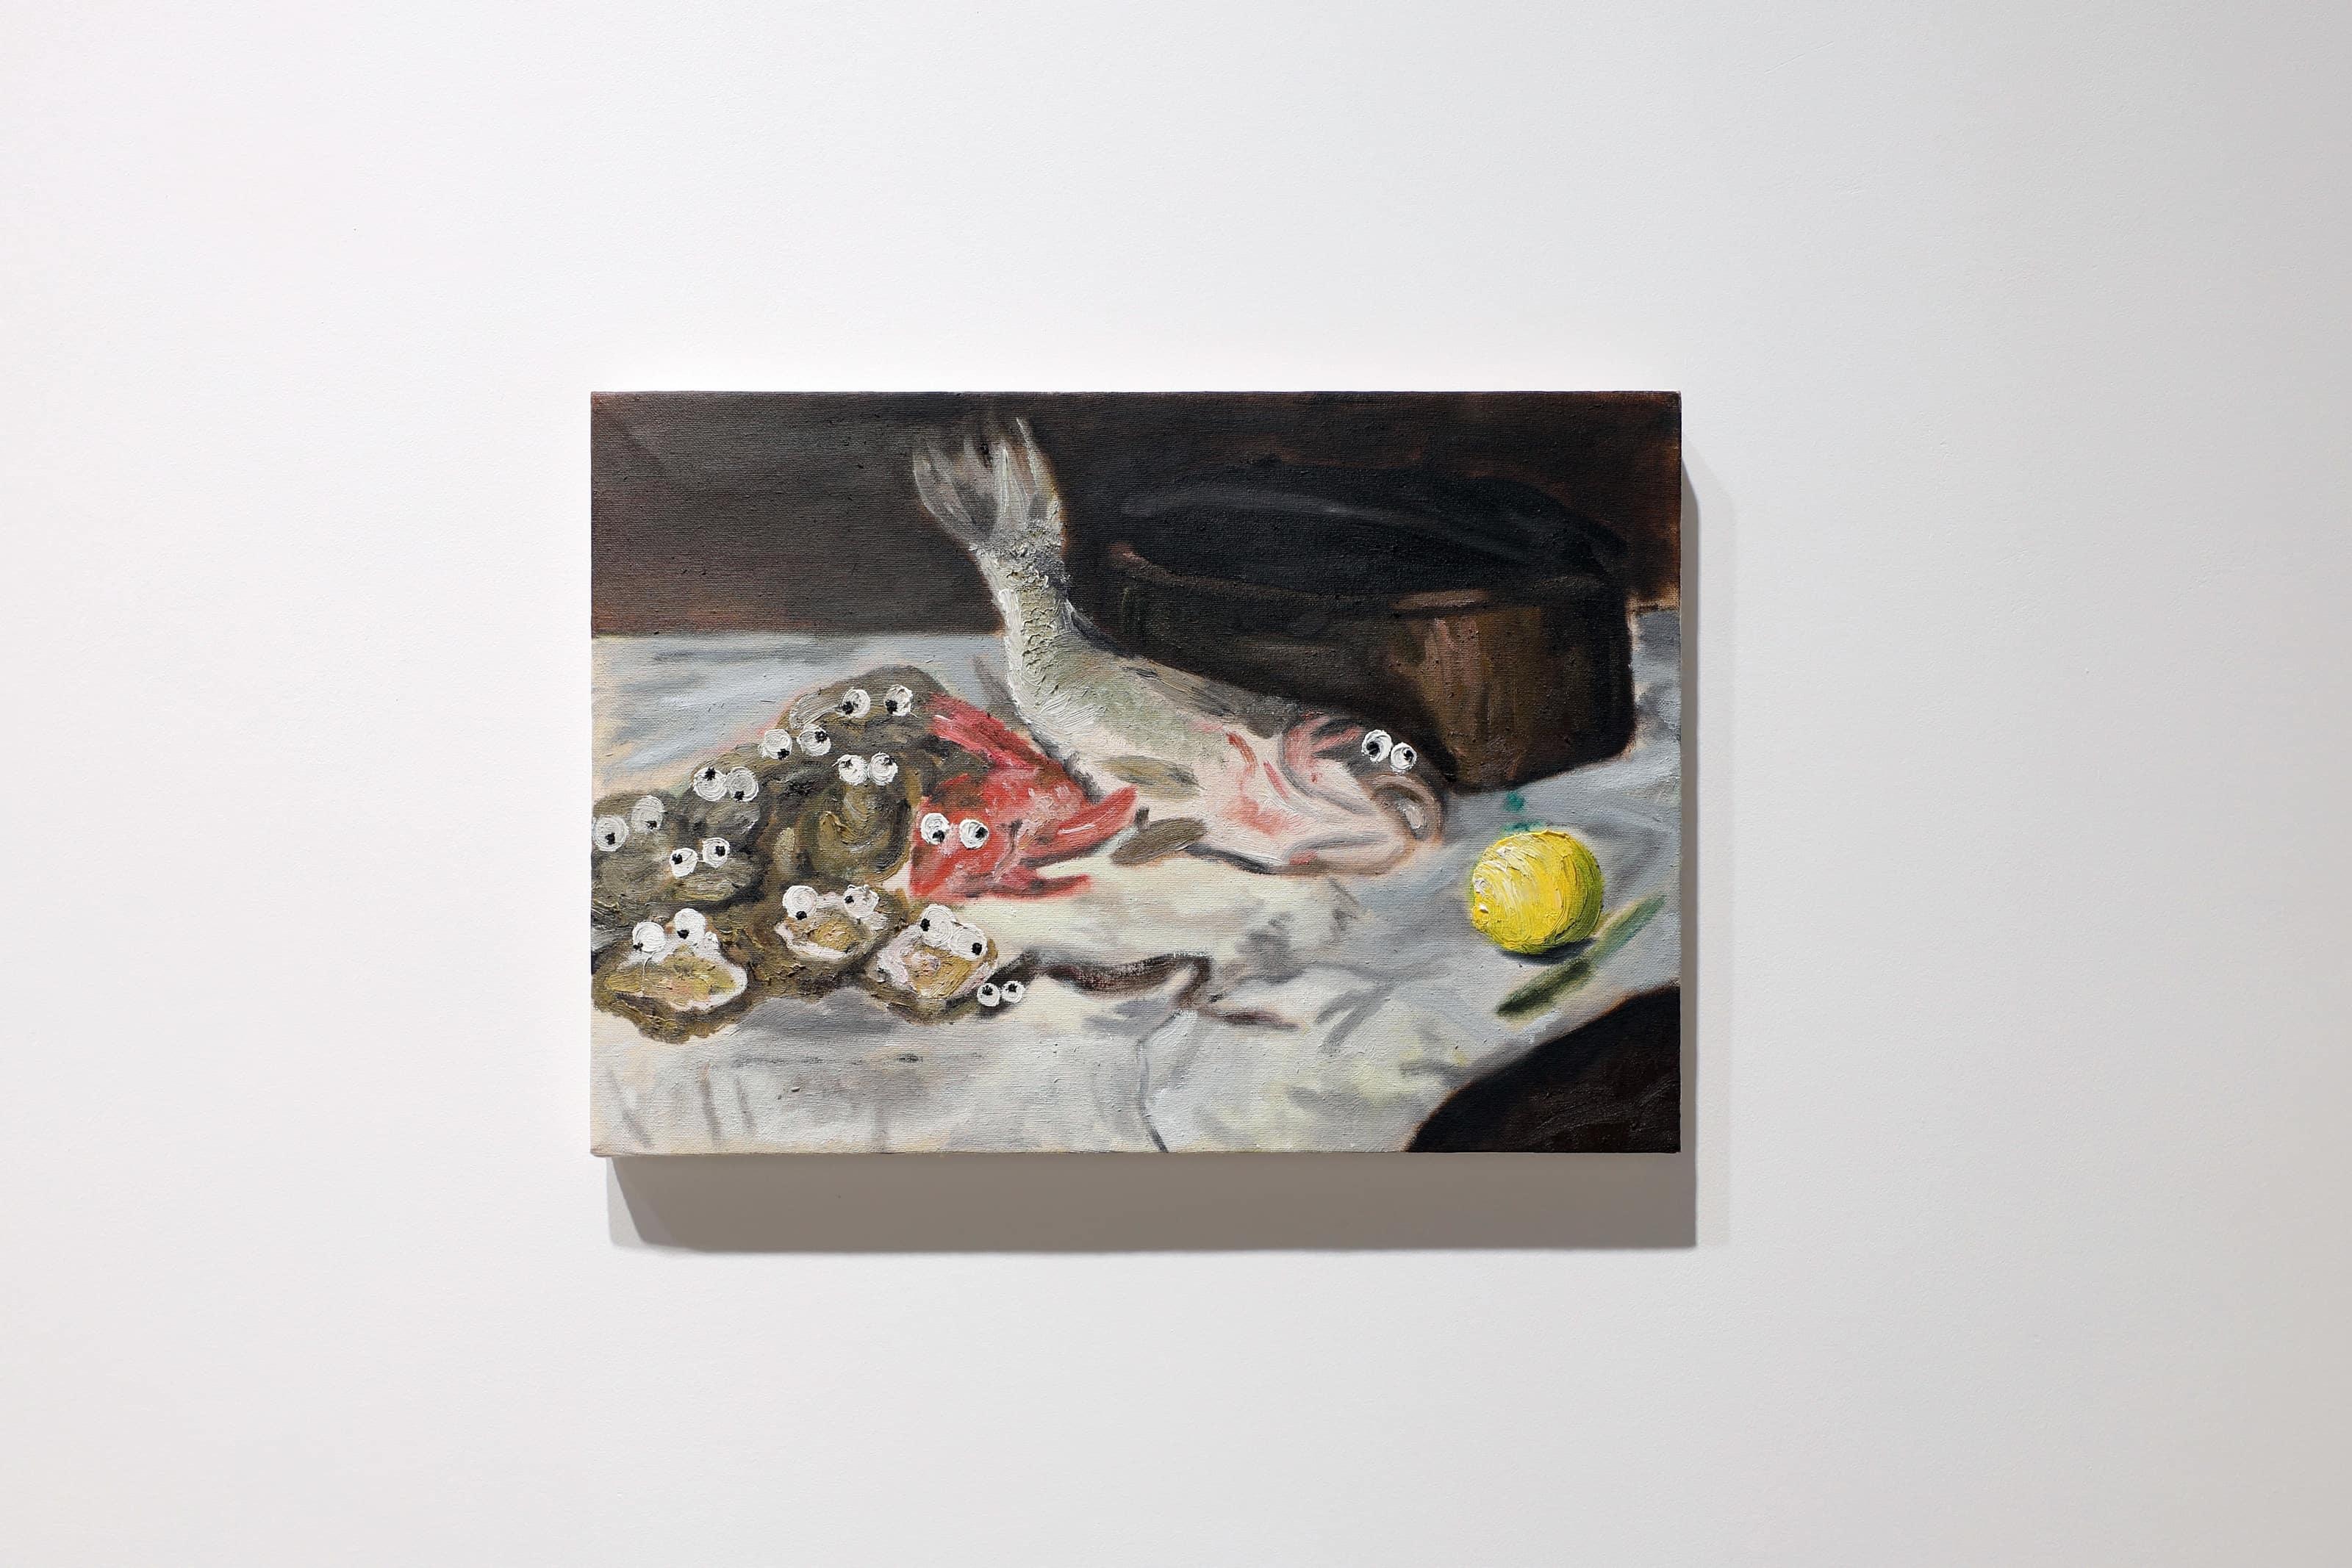 Charles Benjamin, La Menina, 2020, oil and objects on canvas, 170 x 200 x 7.5cm